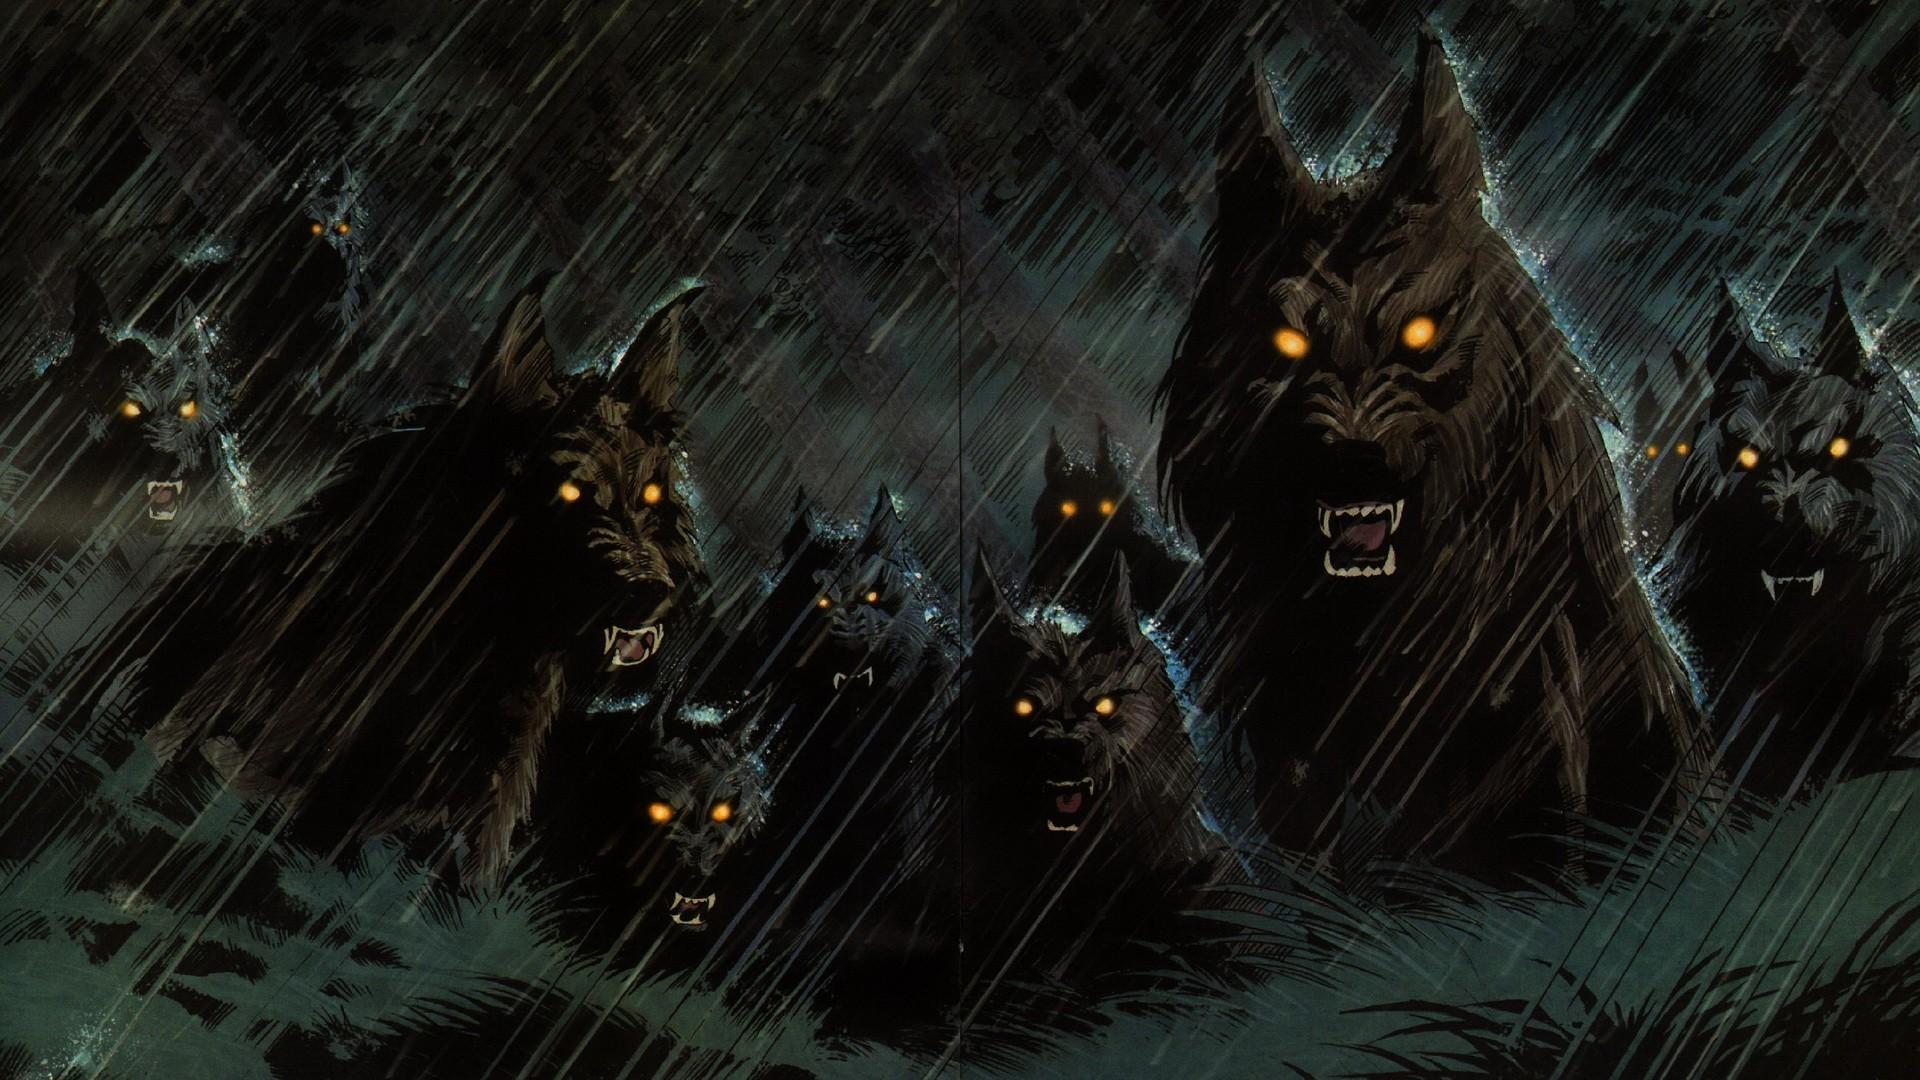 Res: 1920x1080, Dark werewolf hellhound animals wolf wolves fangs demons evil fantasy  predator horror creepy spooky storm rain halloween wallpaper |  |  25972 | ...